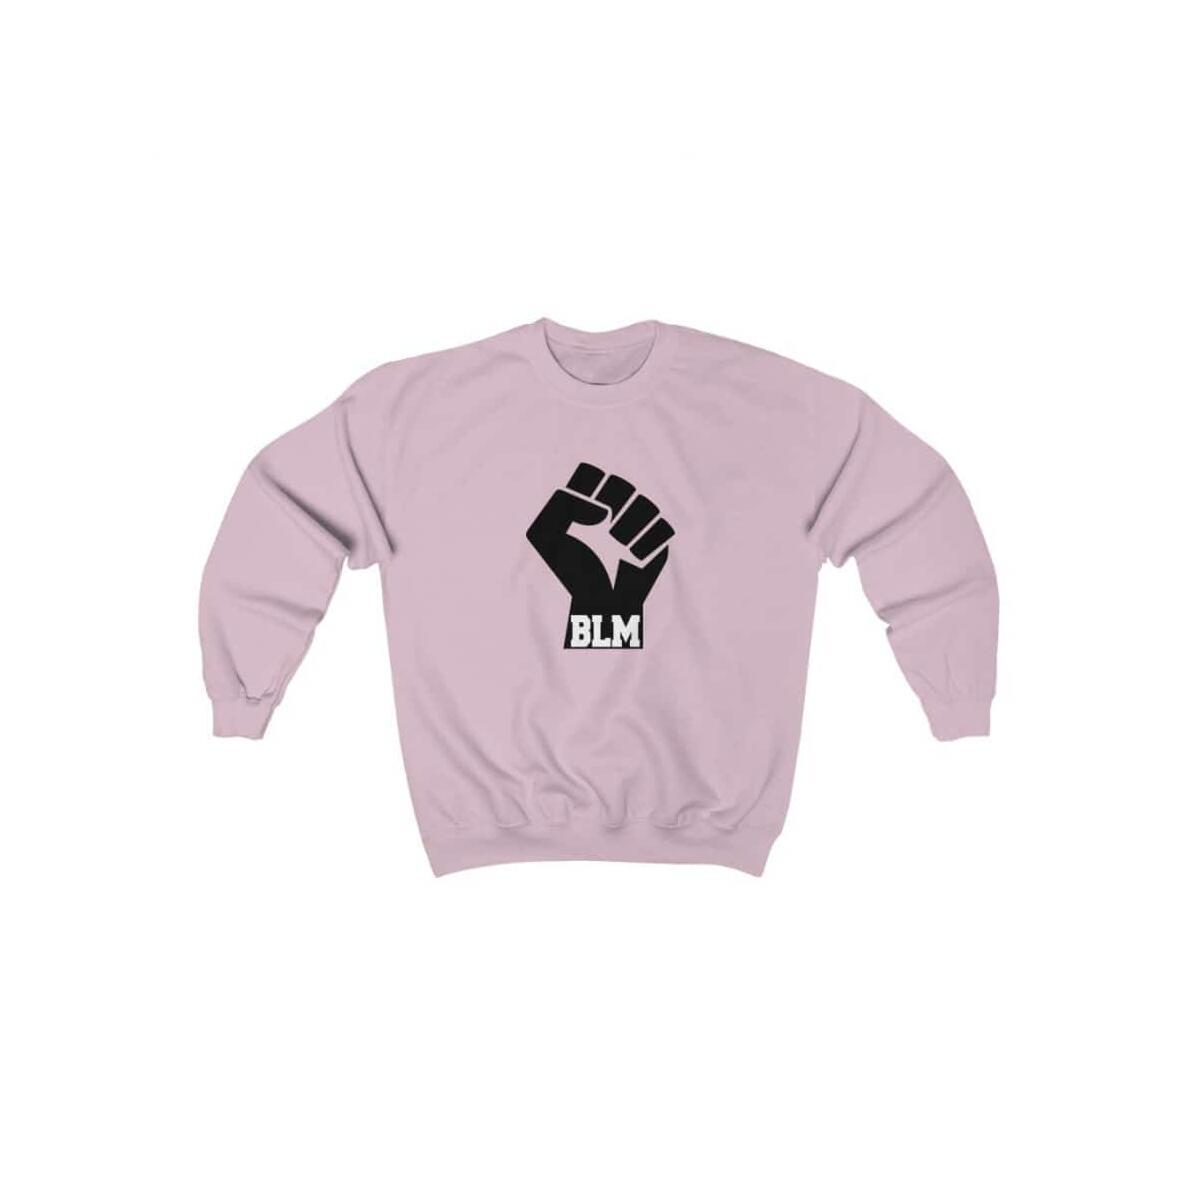 Afrocentric Fist Bottom BLM Crewneck Sweatshirt